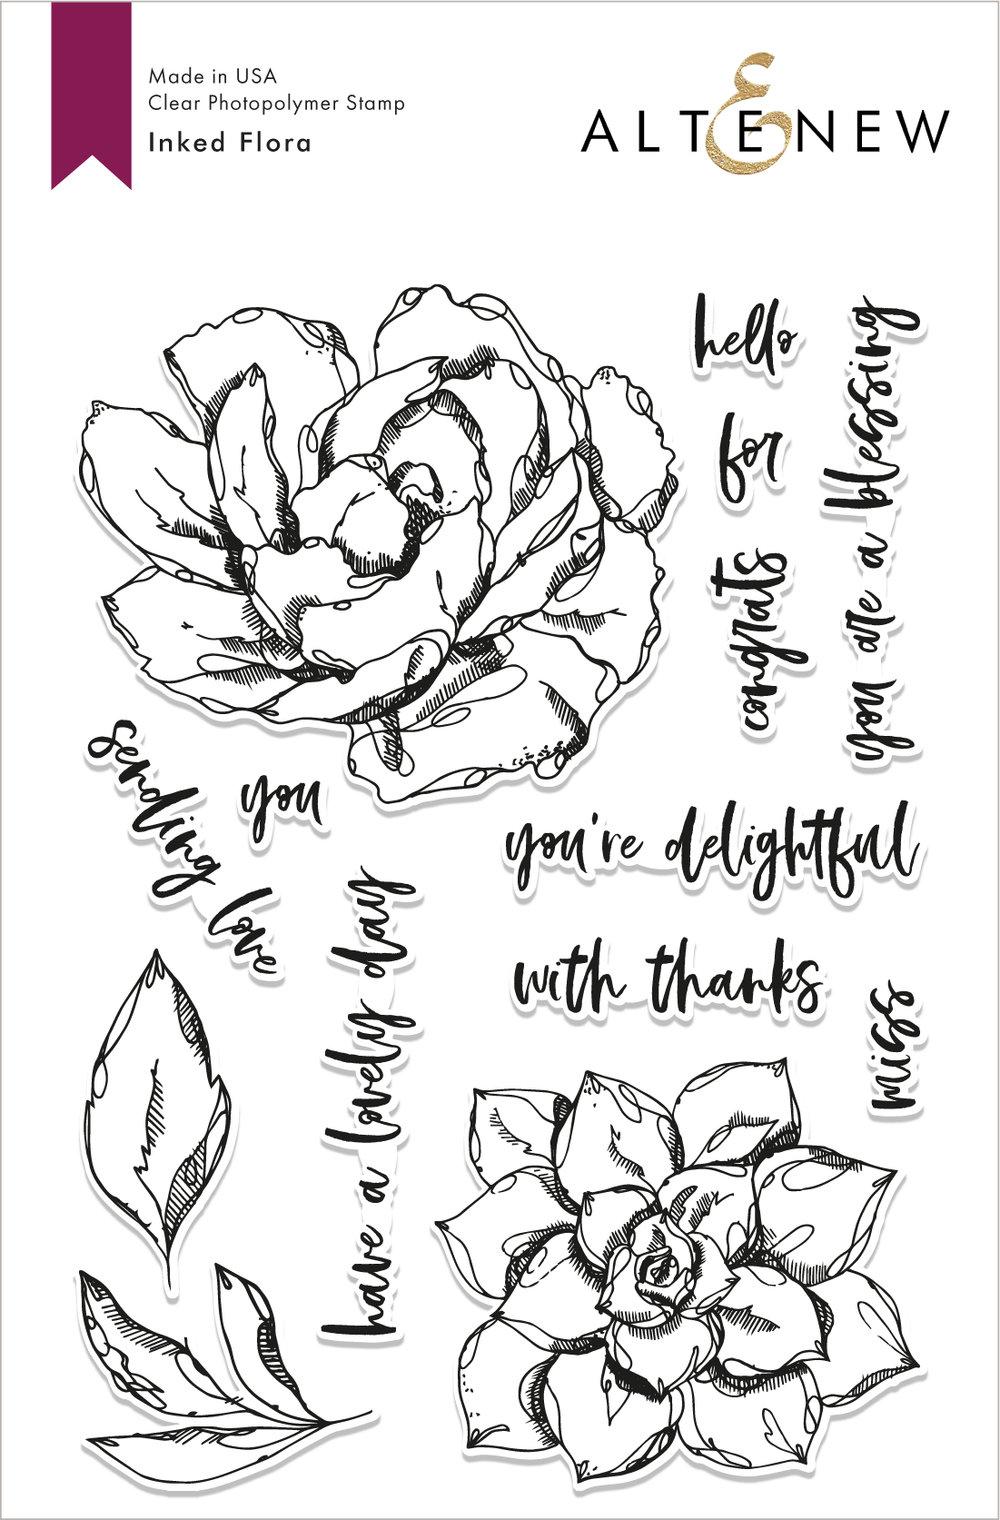 6x8 Inked Flora.jpg